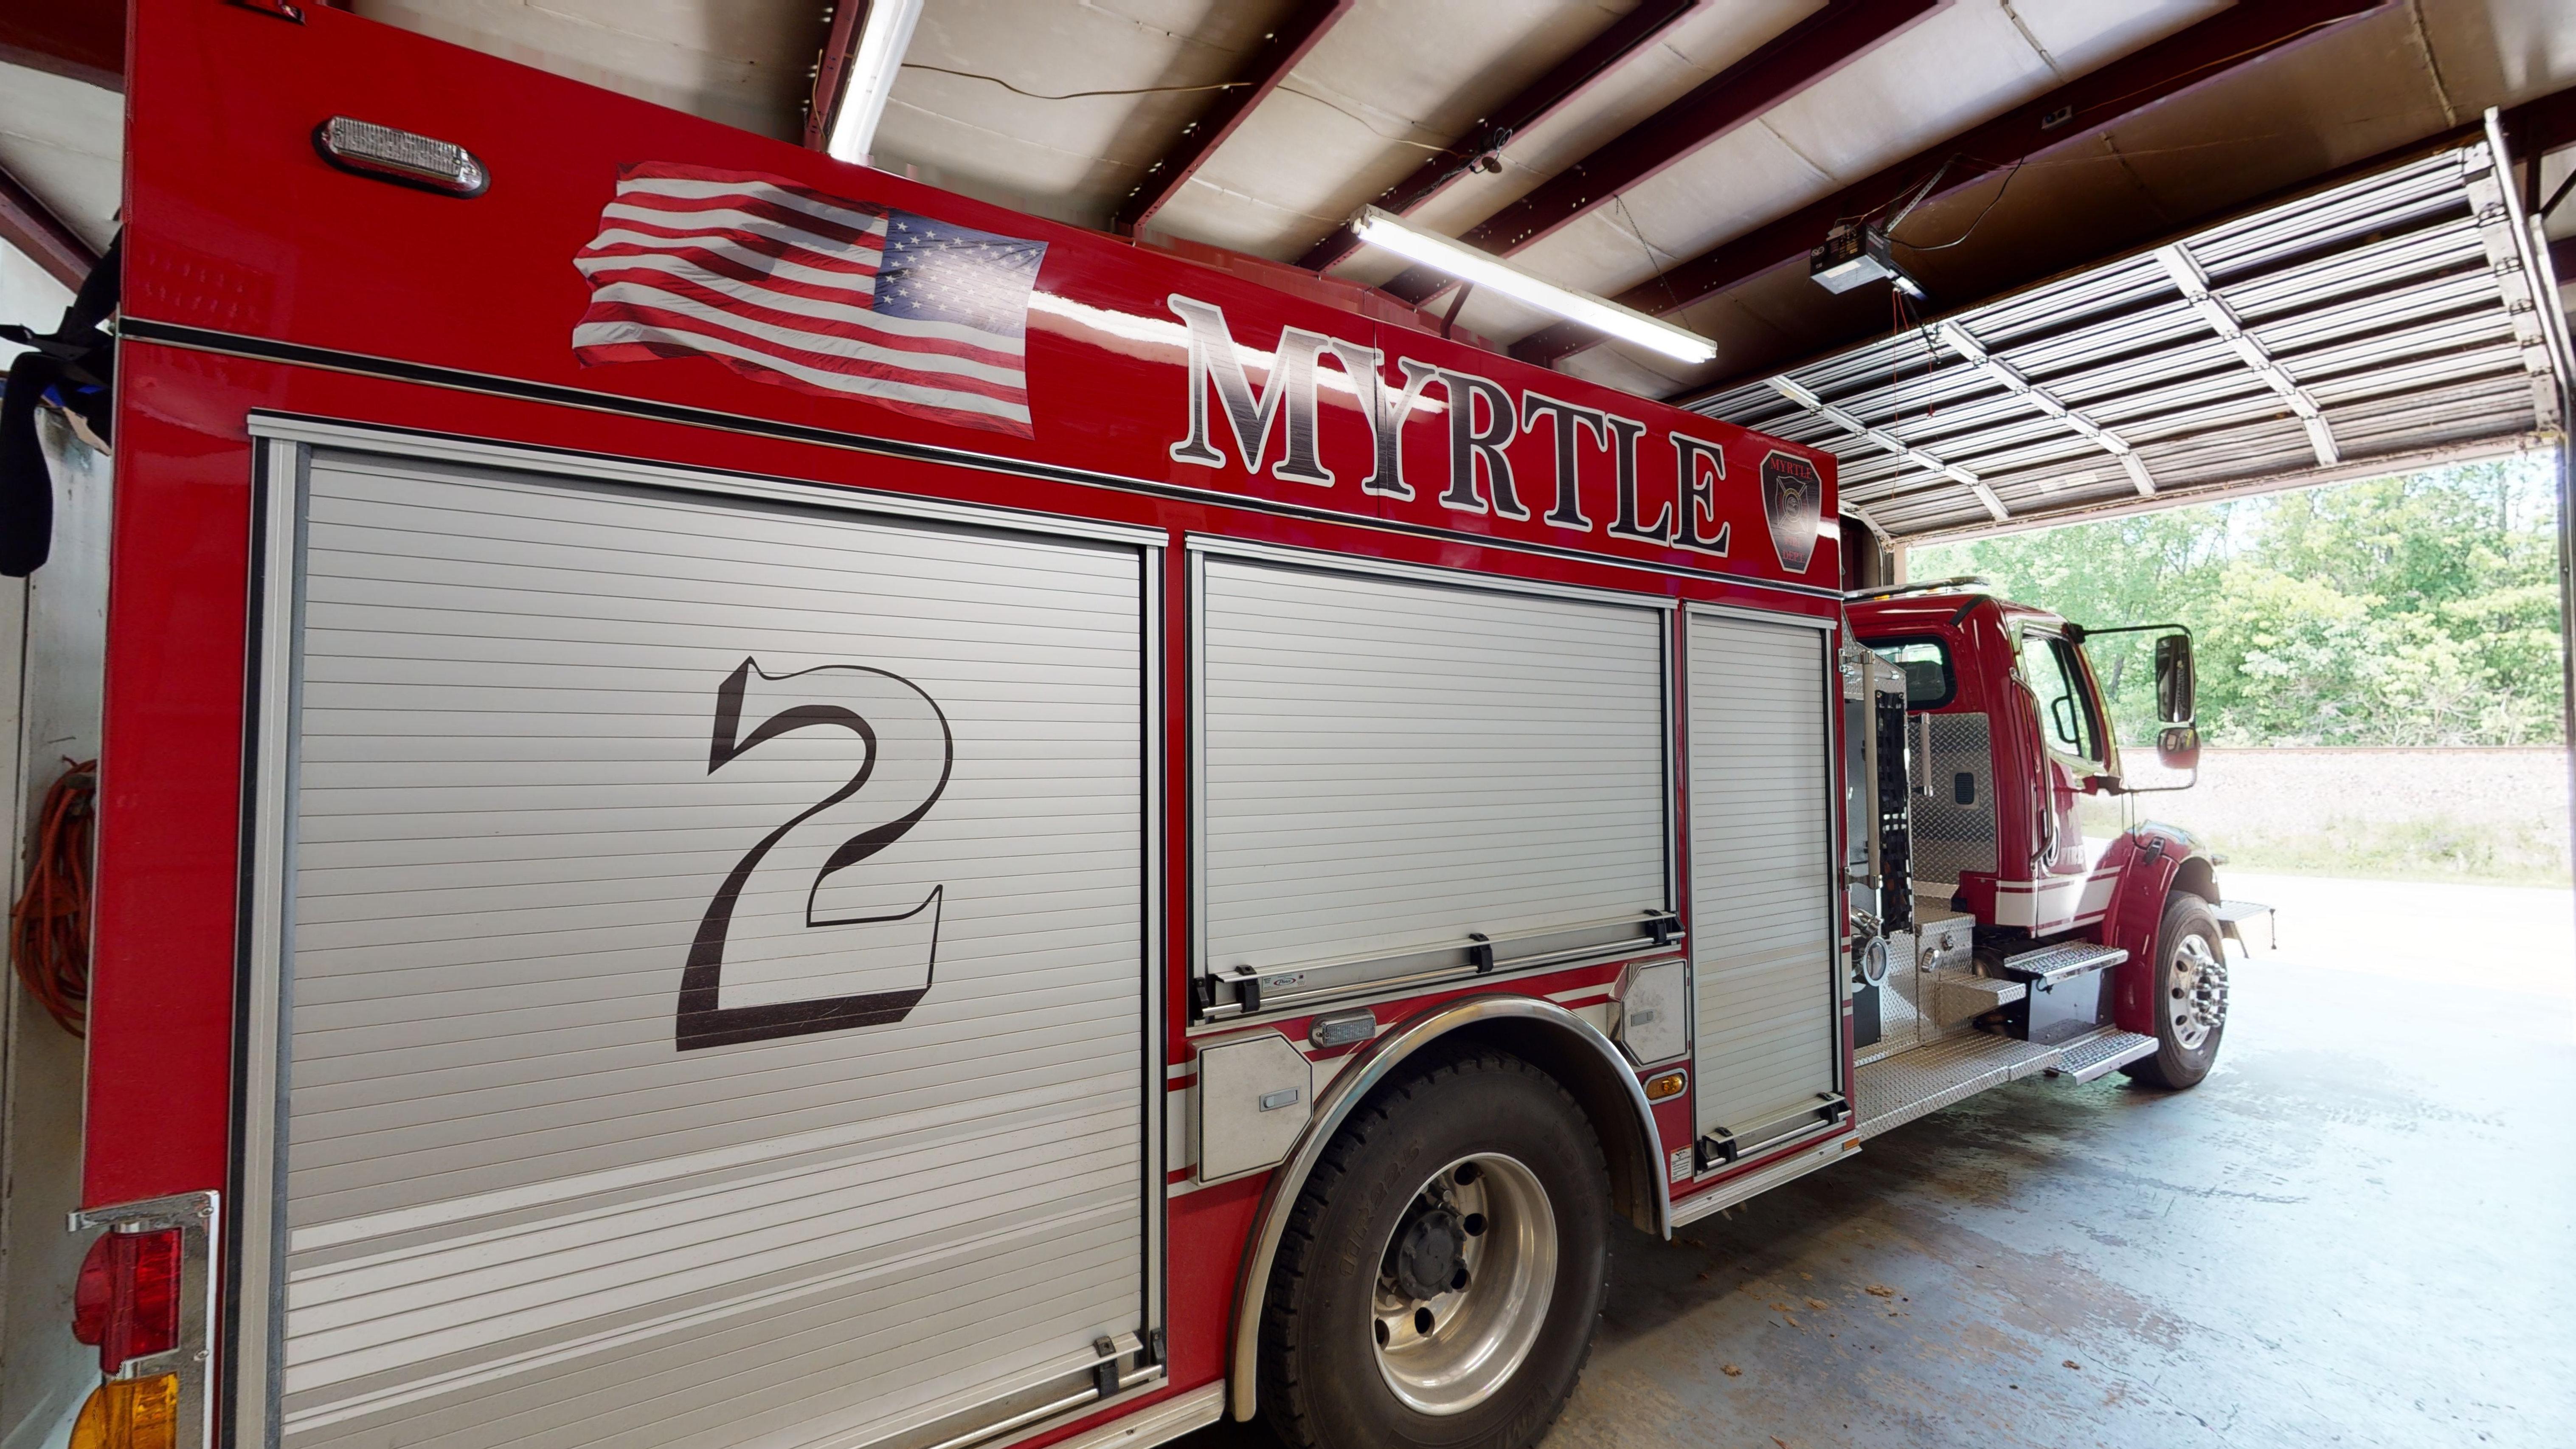 5_Myrtle-FD-Commercial-Pumper-05282021_121102